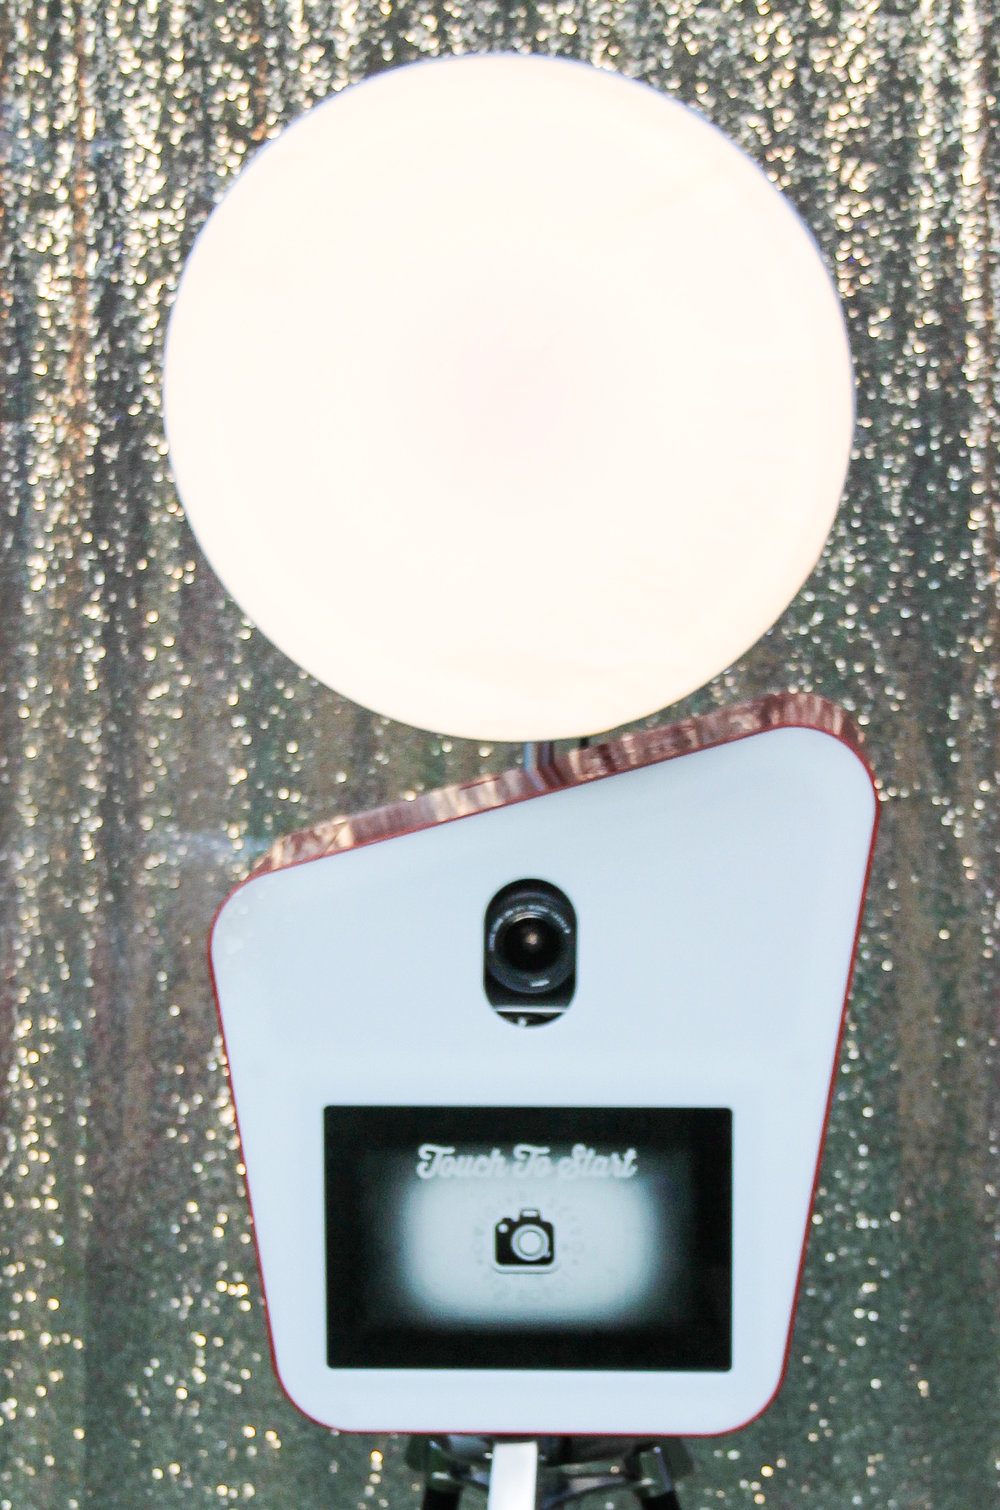 Photobooth dish